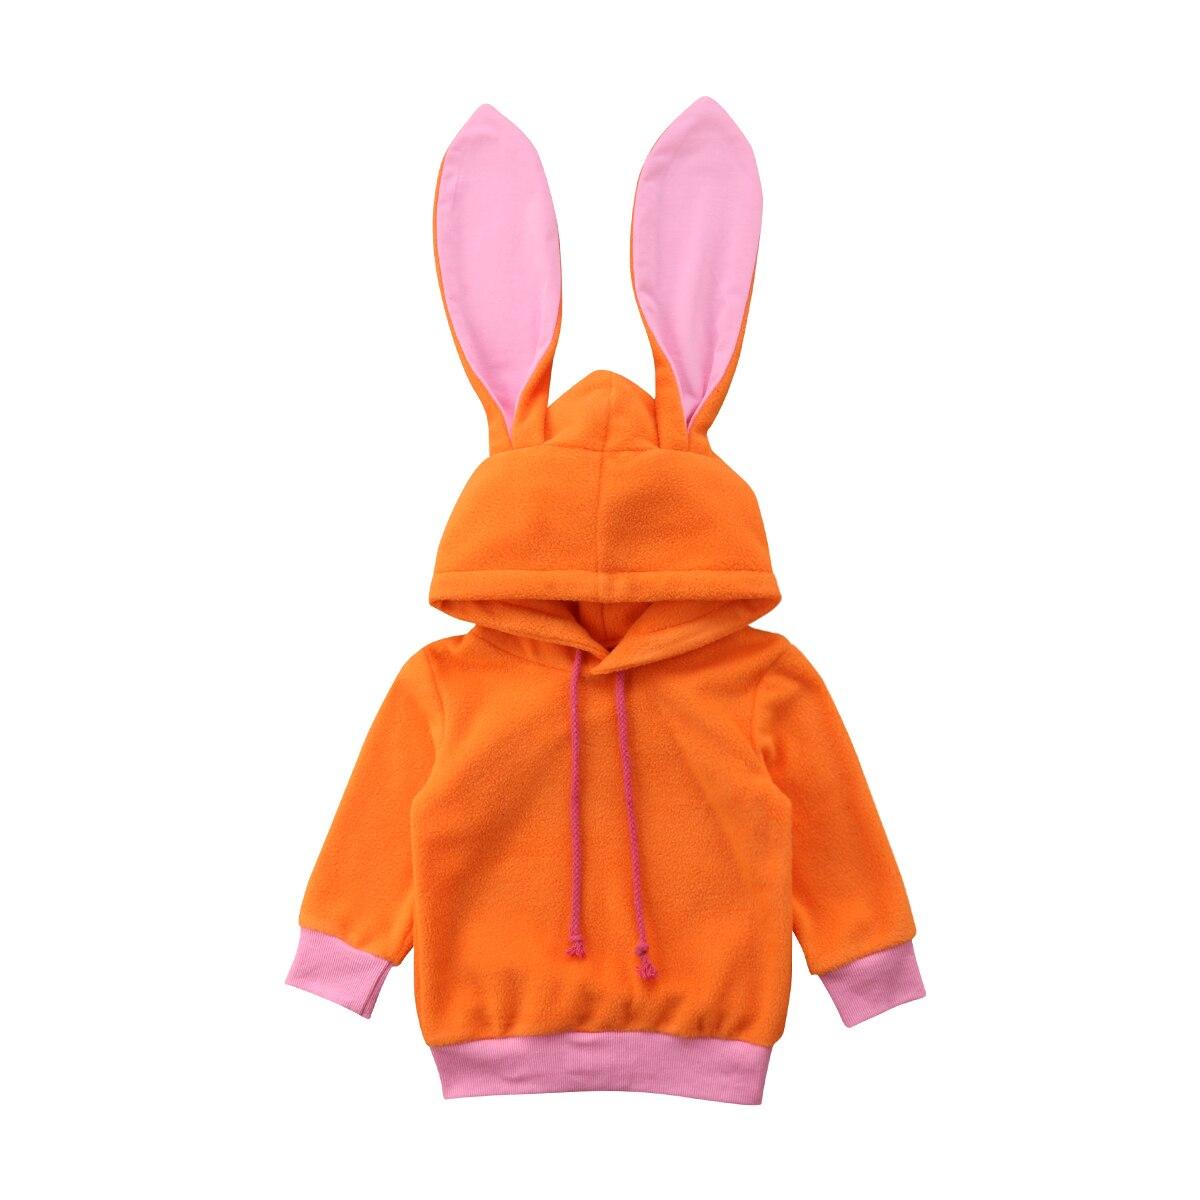 Baby Boys Girls Cozy Winter Neckerchiefs Velvet Warm Wraps Scarves Cartoon Bunny Collar Neck Warmer Kids Cute Kids Scarf Children Collar Circle Scarf Hood Shawl